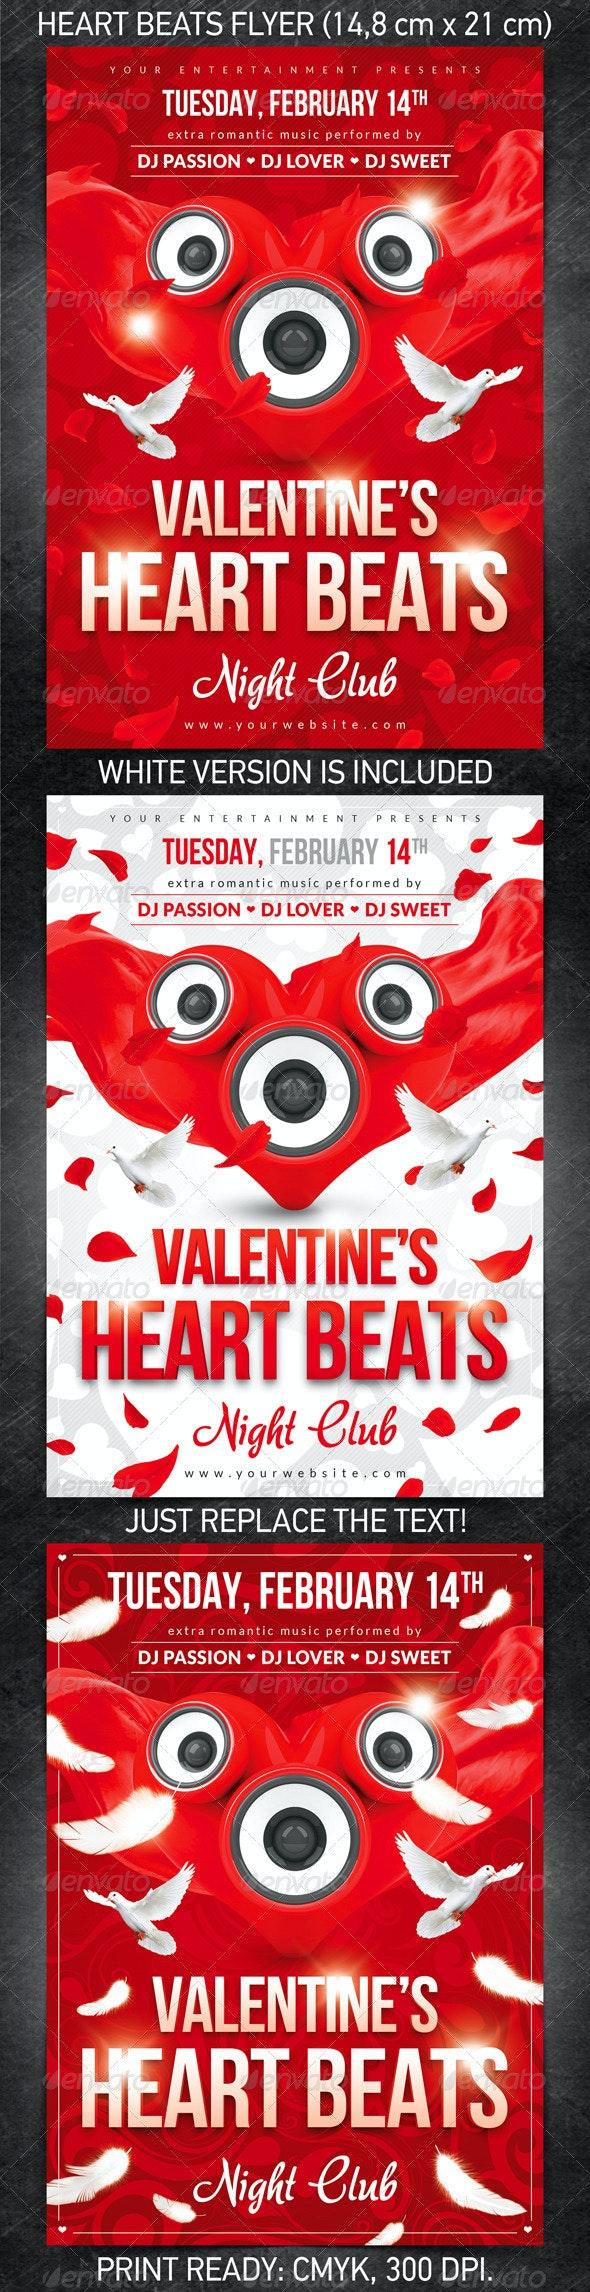 Heart Beats Flyer - Clubs & Parties Events